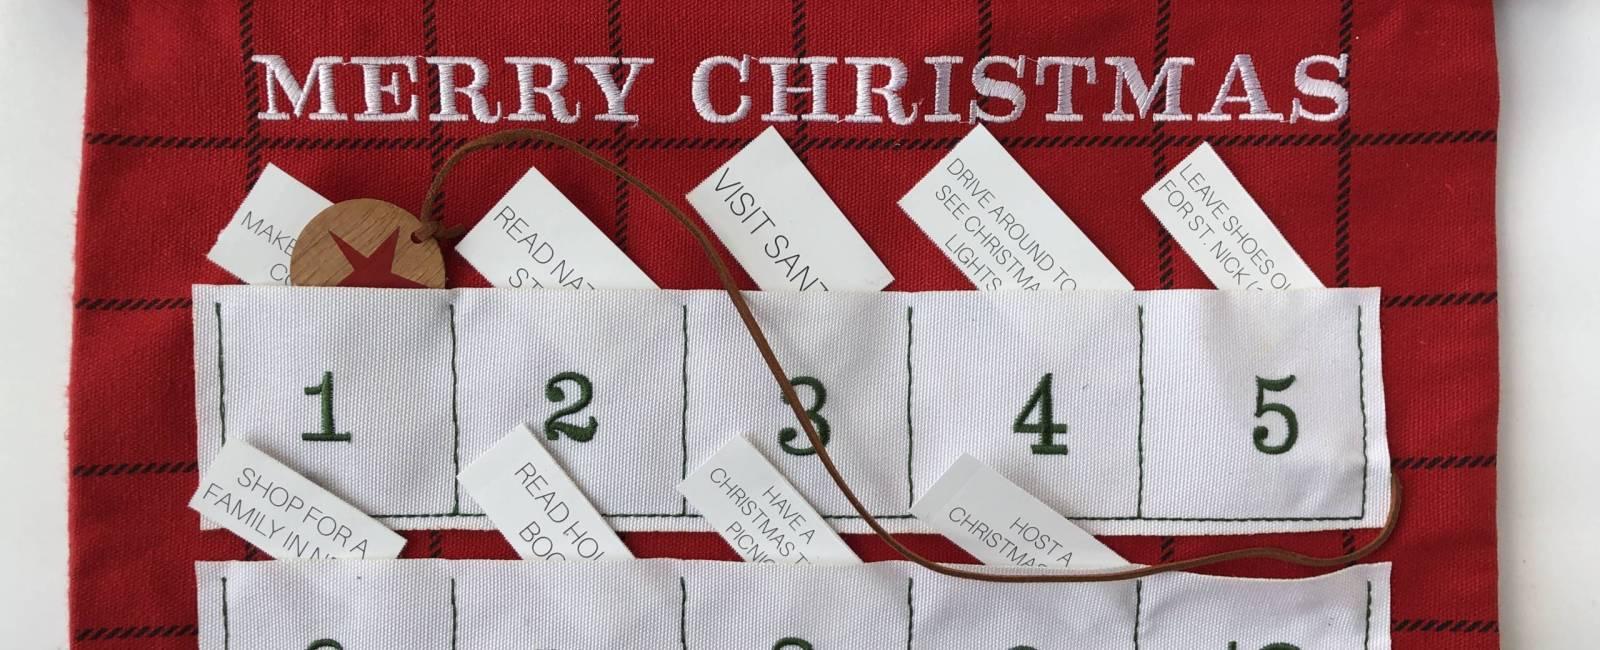 Advent Calendar Gift Guide + More